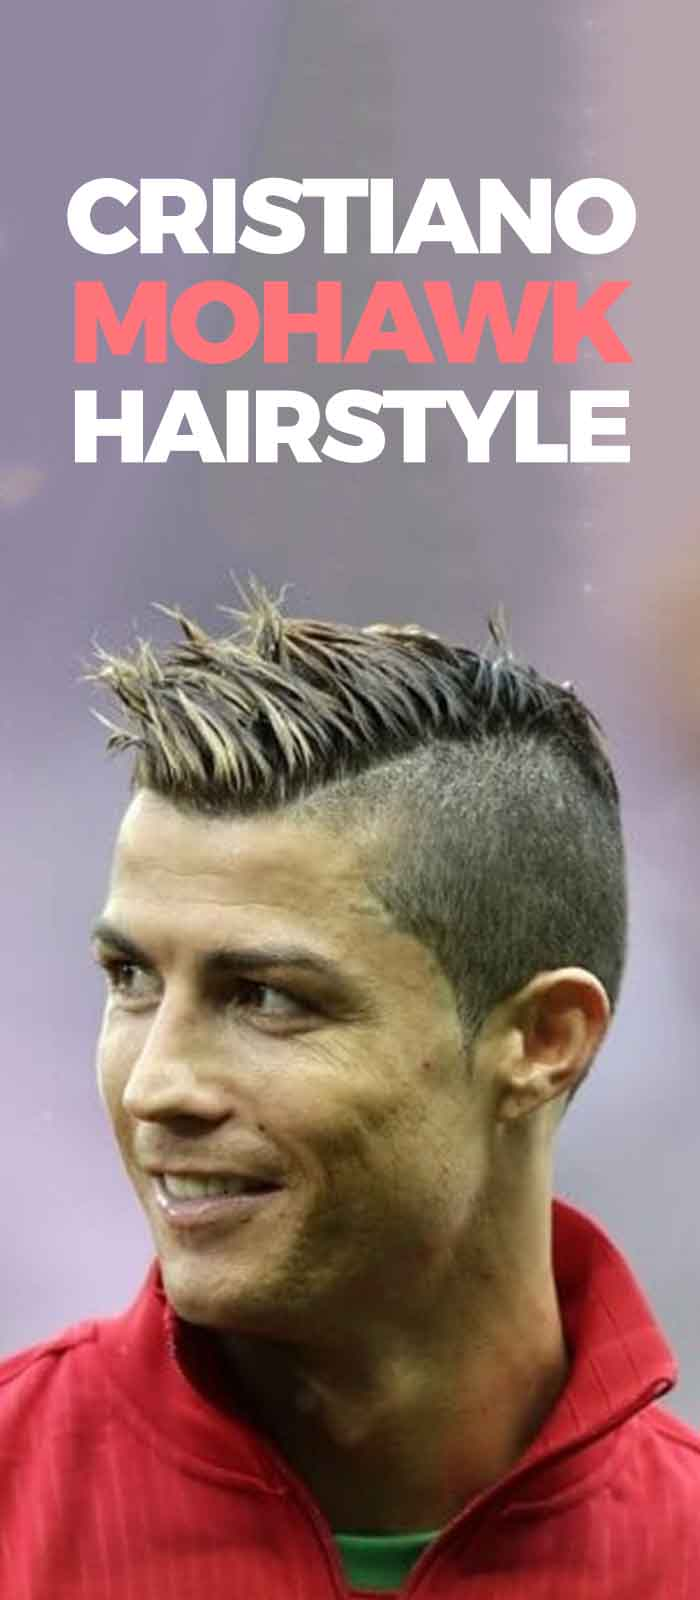 Mohawk Hairstyle – Cristiano Ronaldo Edition 2019